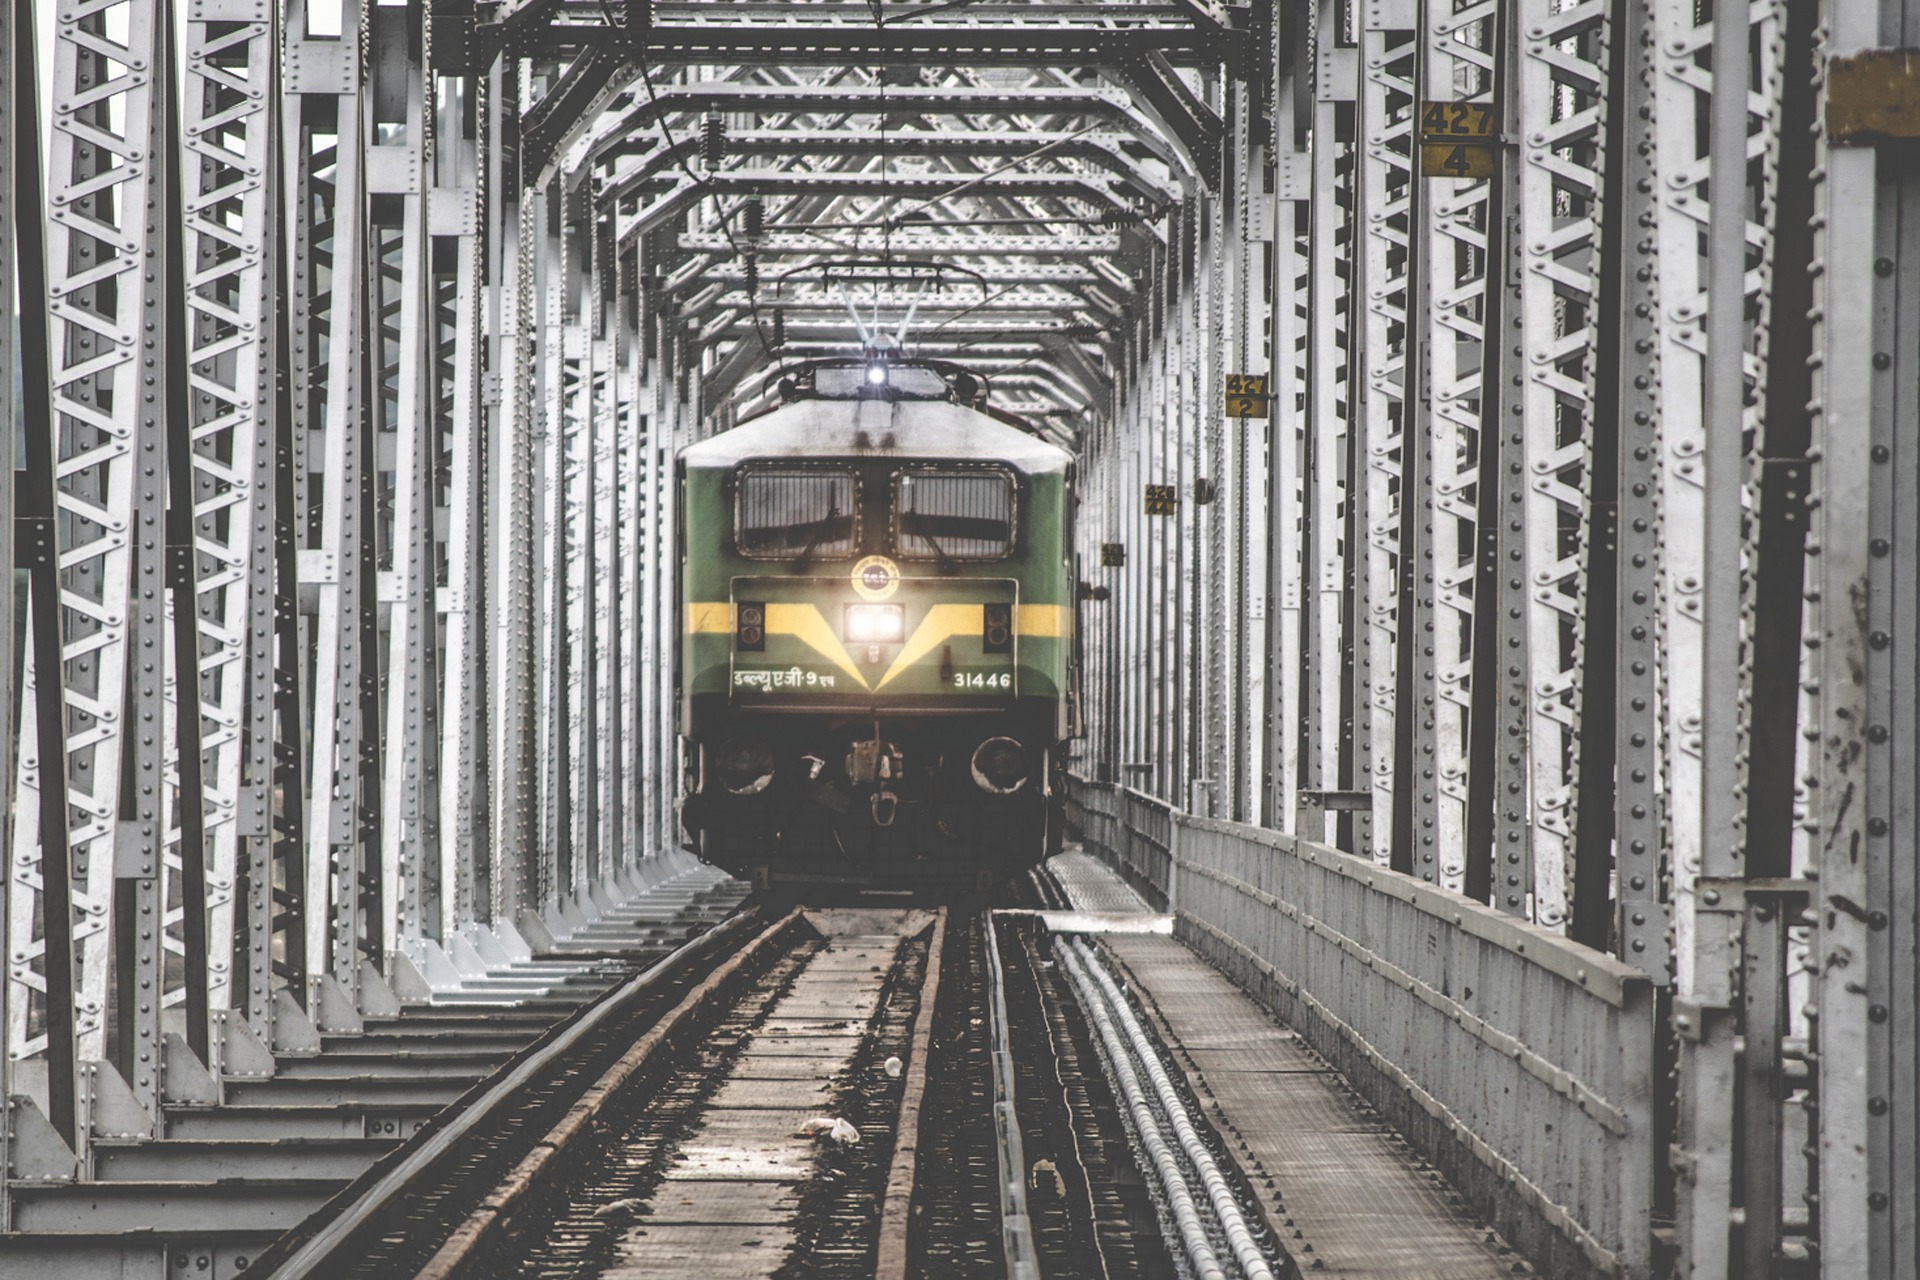 tren, ブリ�鉄道carril, インド, 運動 - HD の壁紙 - 教授-falken.com